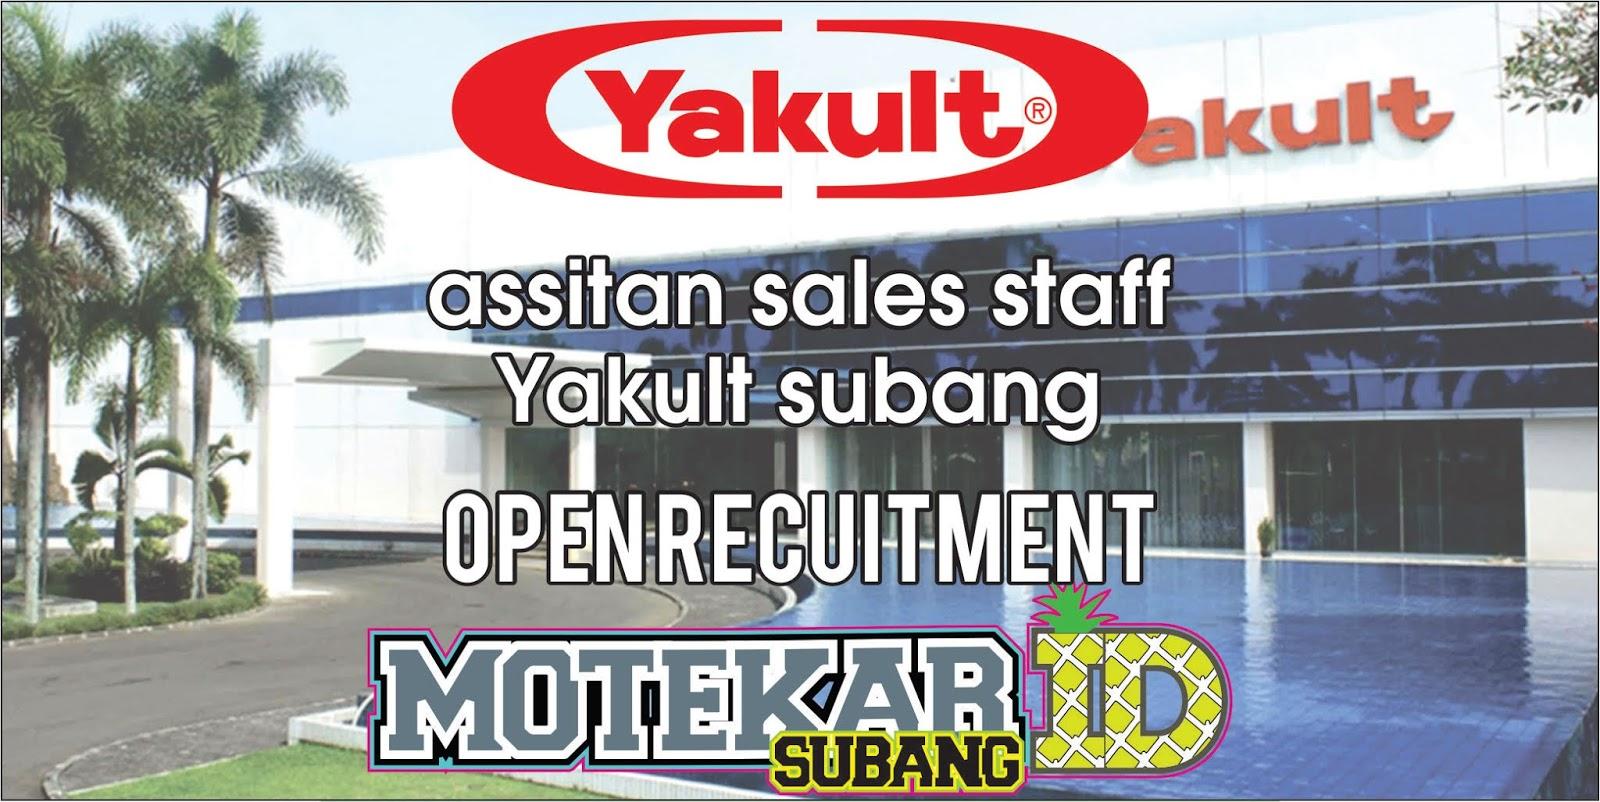 Info Loker Asisten Sales Staff Yakult Subang Juni 2019 Motekar Subang